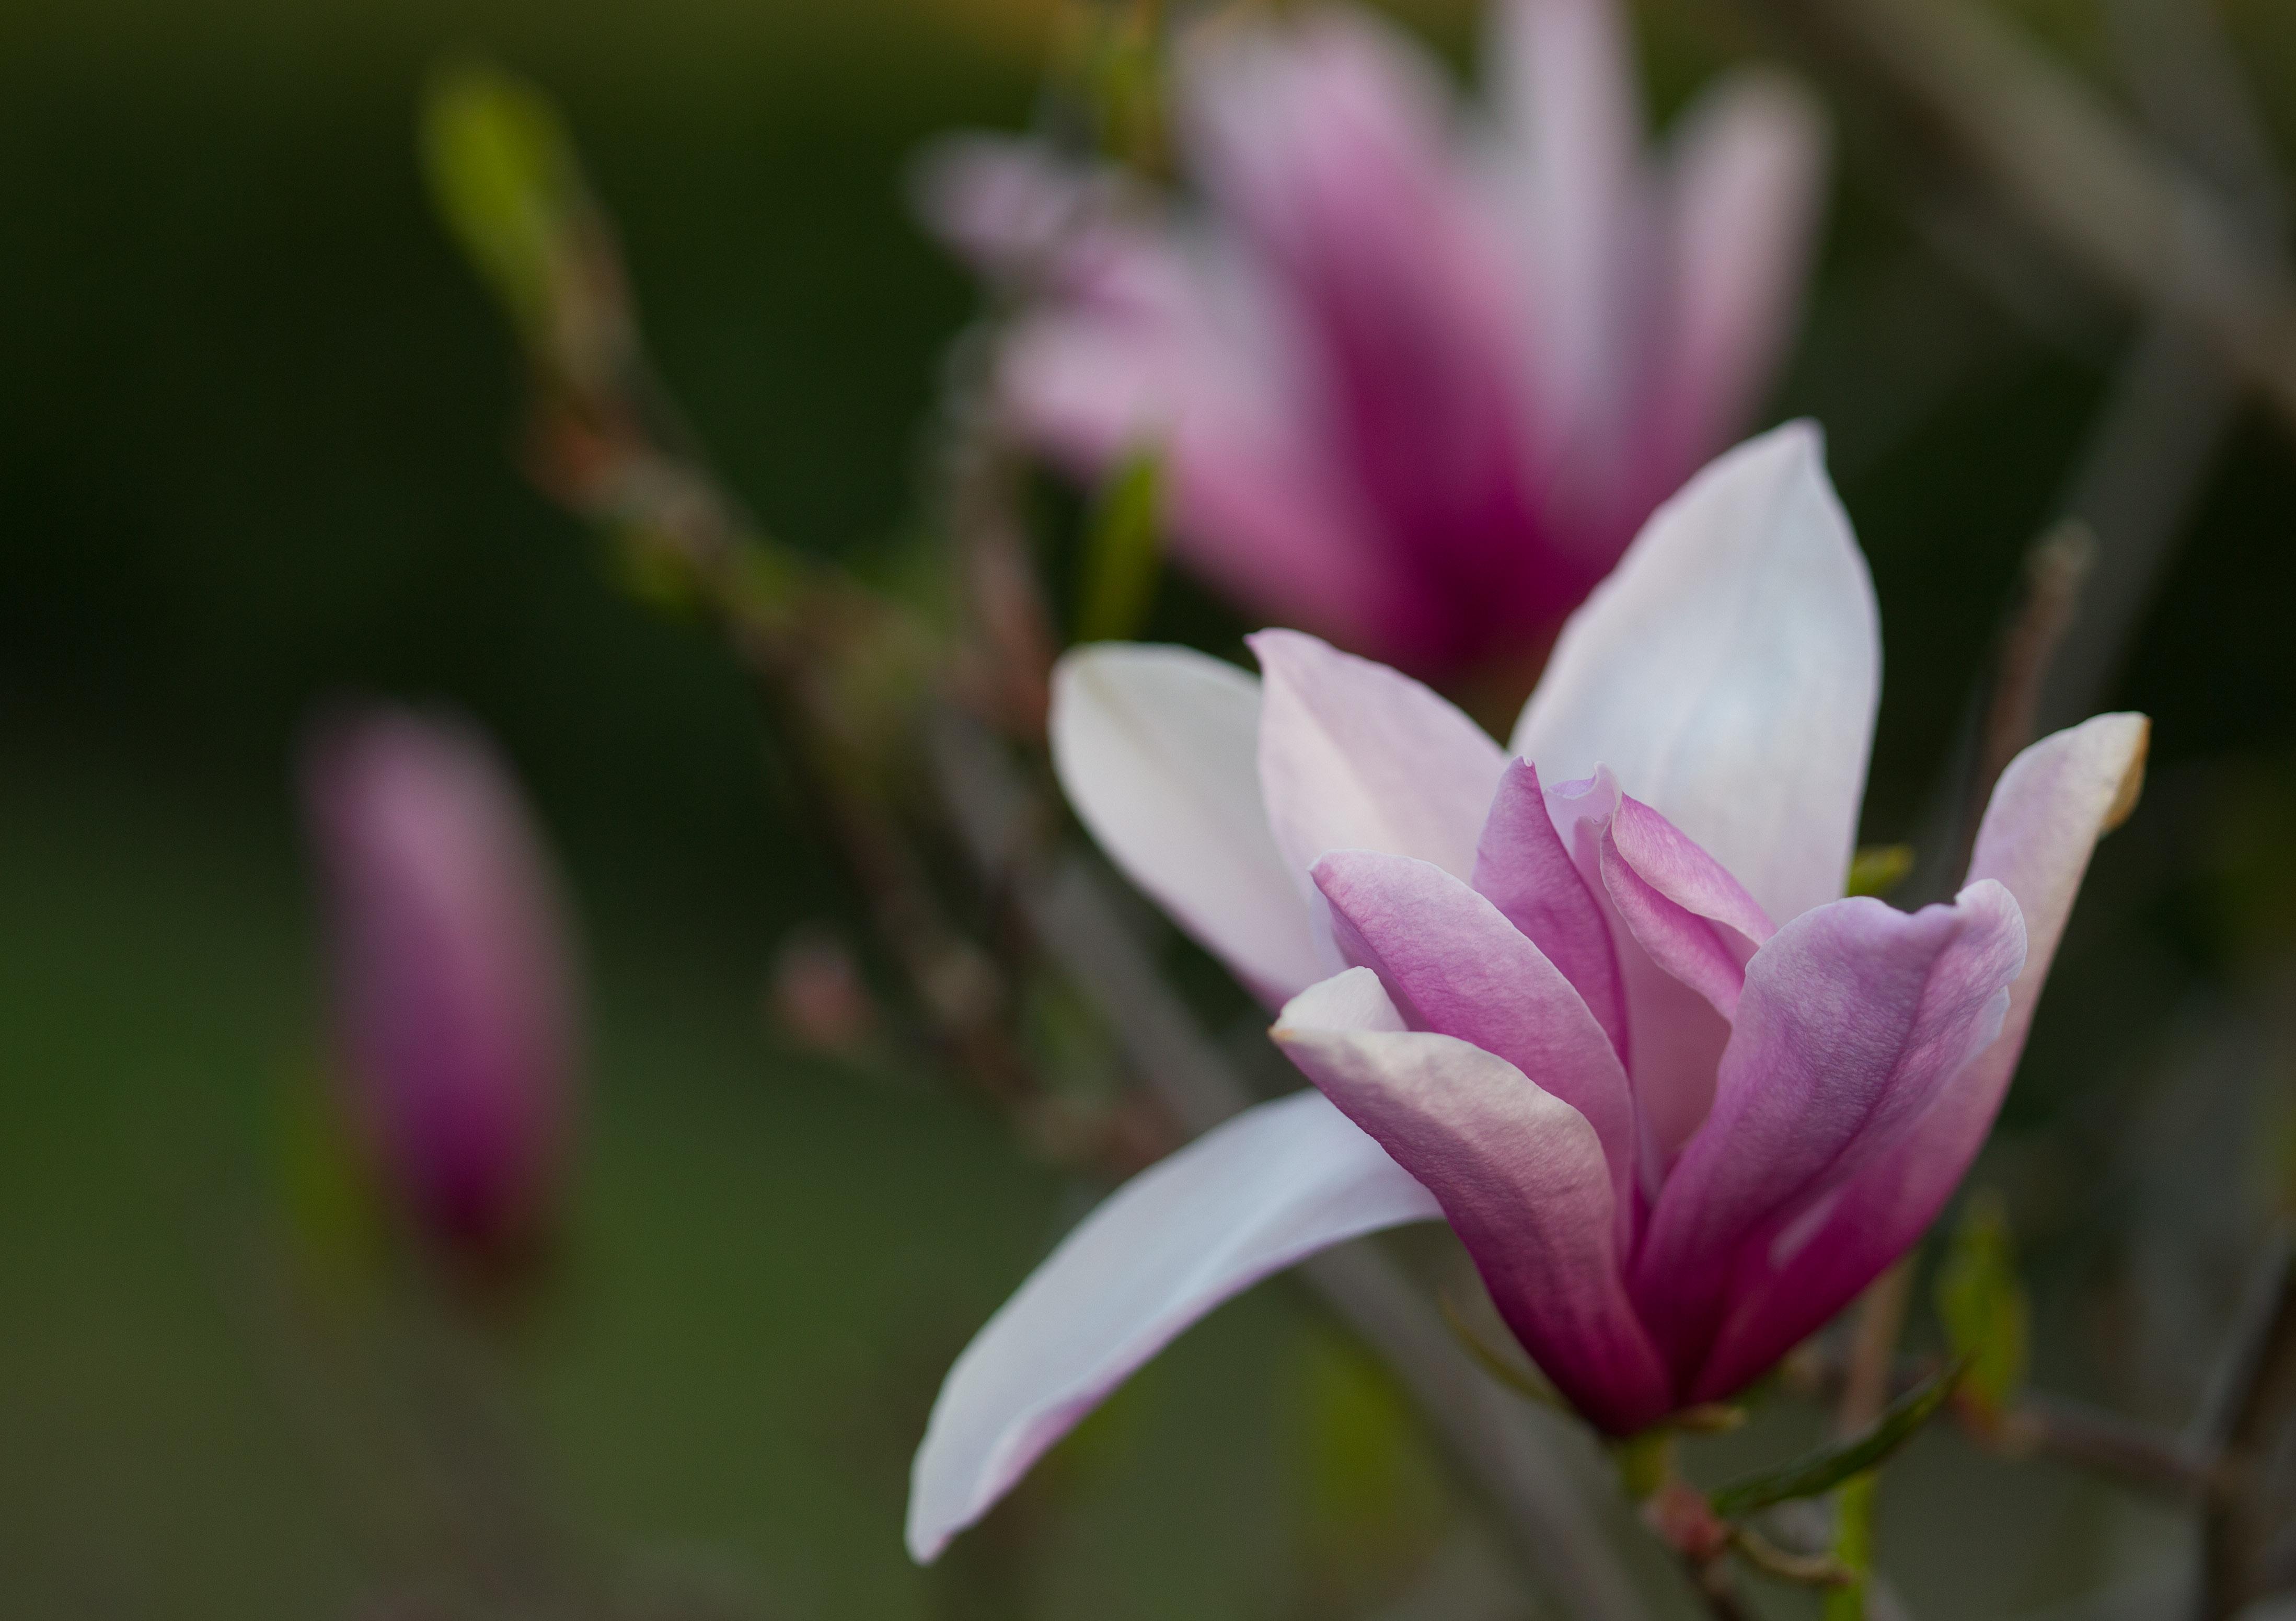 Magnolia w Parku Traugutta